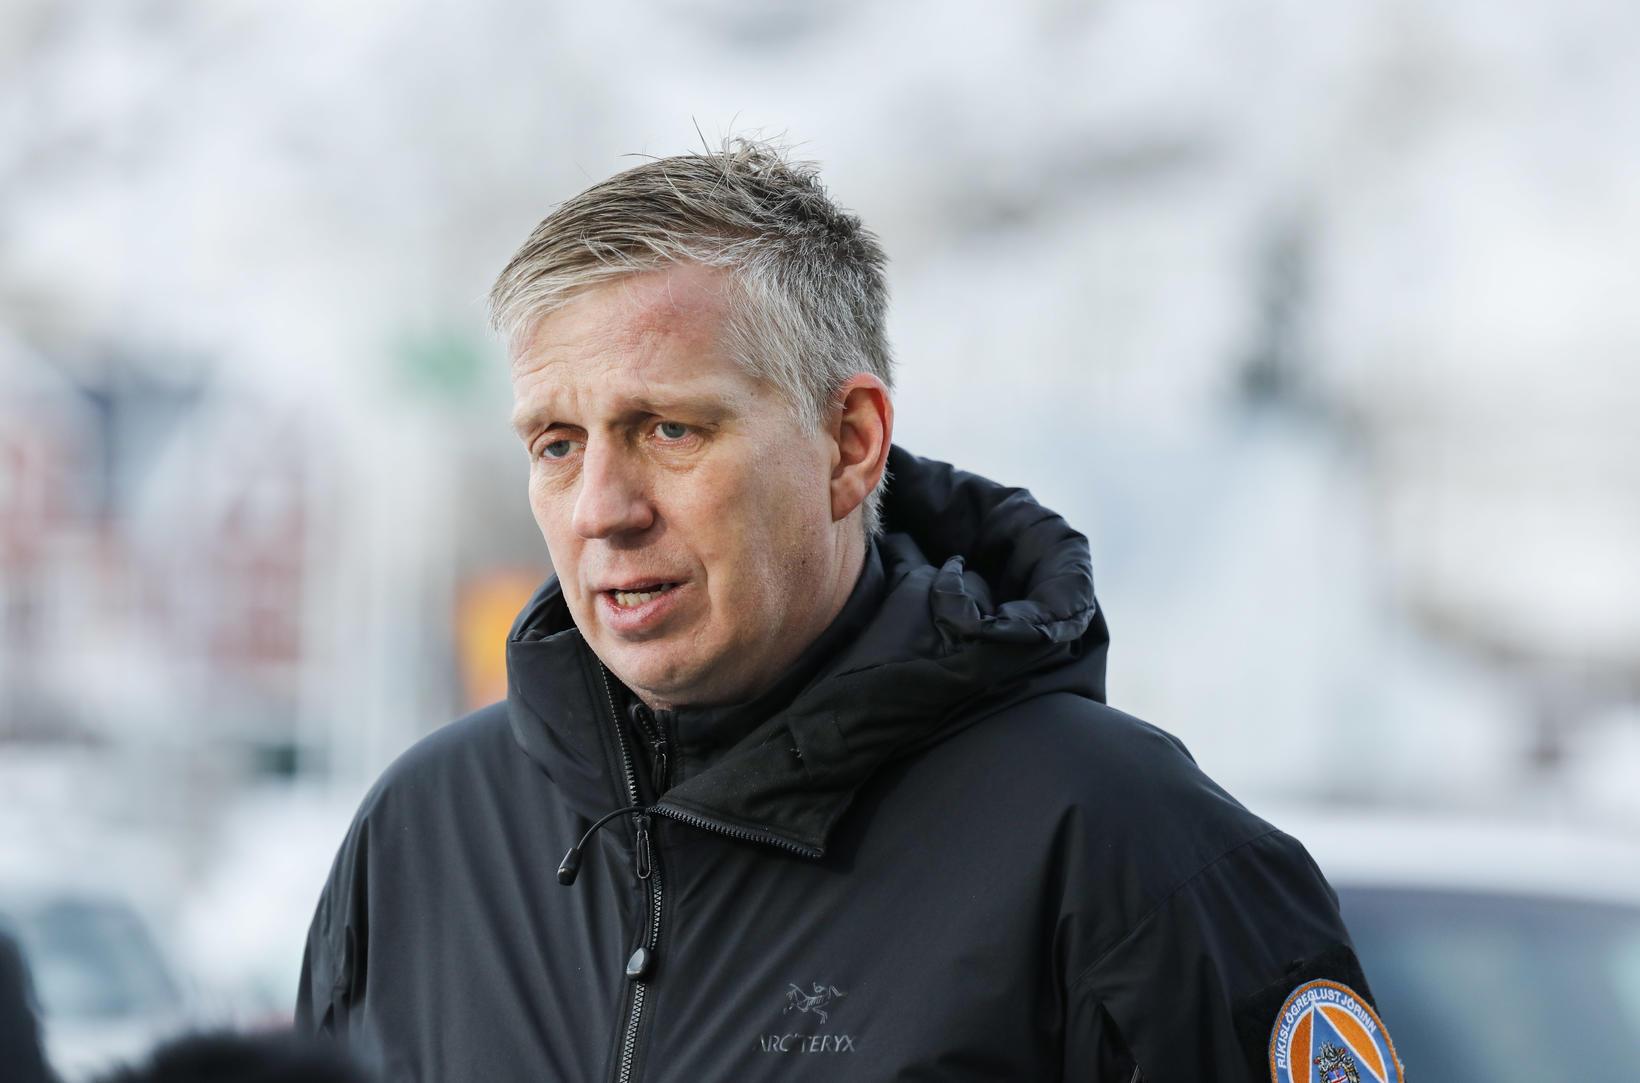 Chief Superintendent Víðir Reynisson.